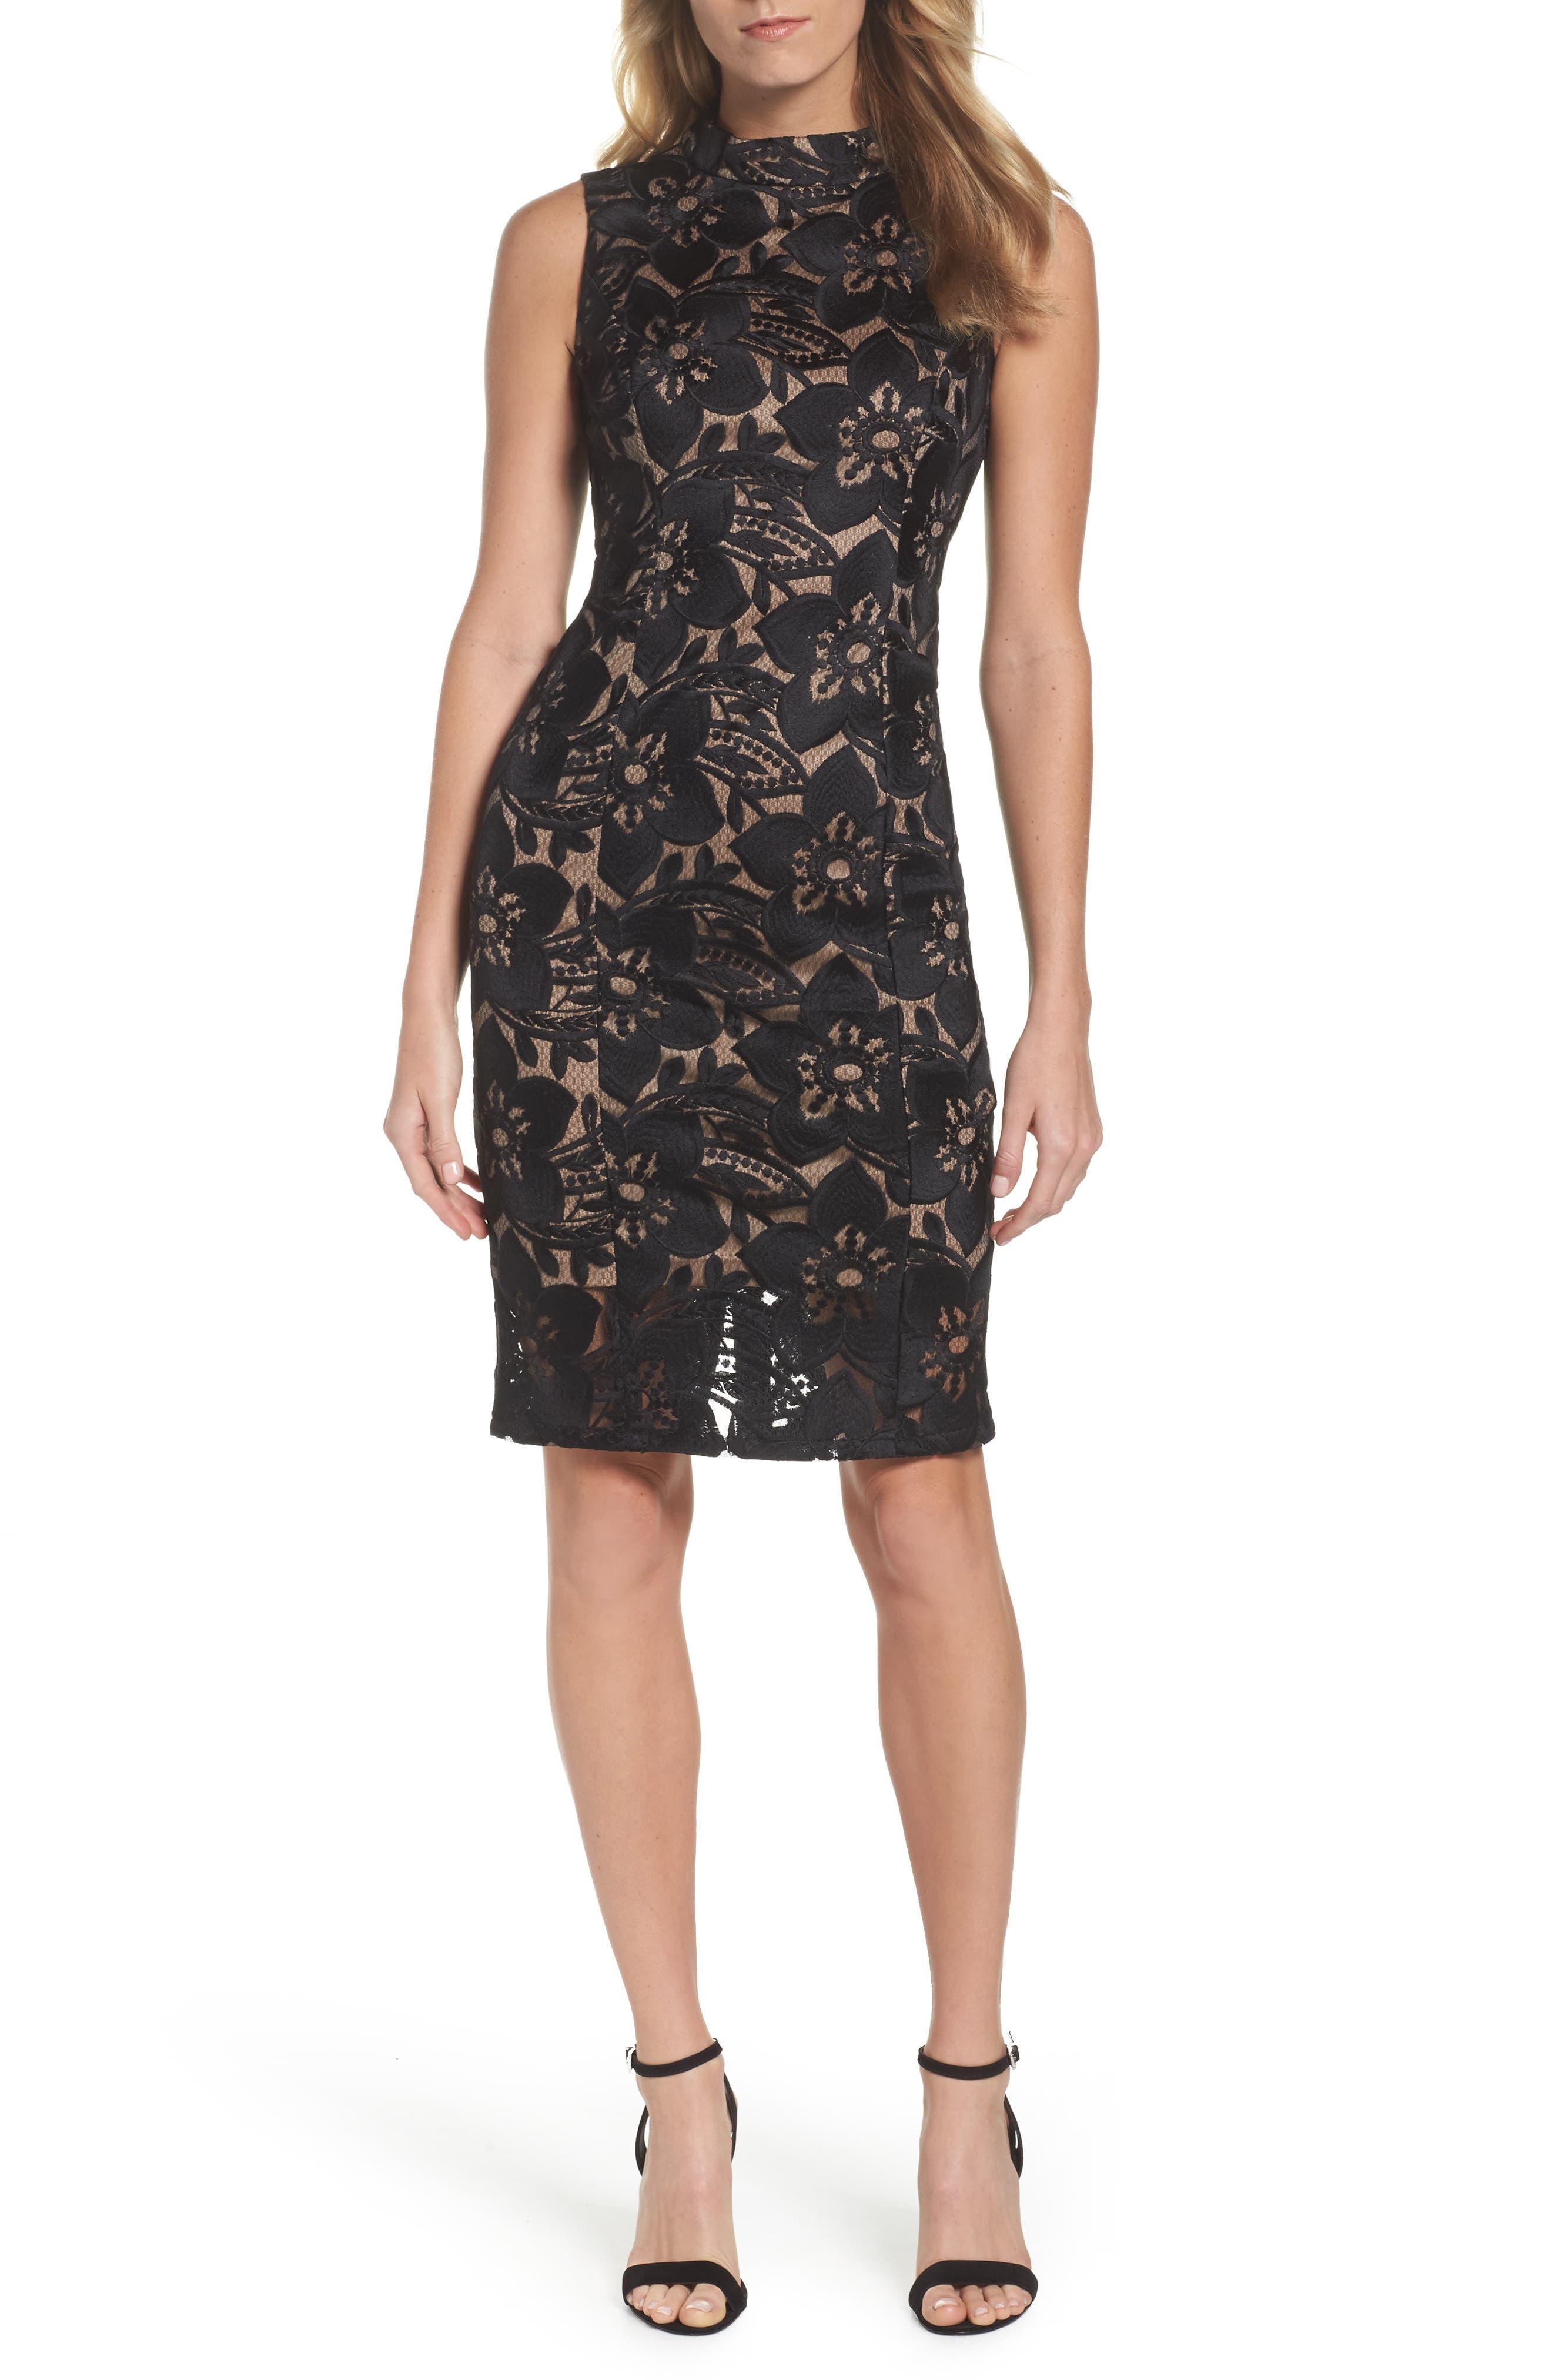 ADRIANNA PAPELL Lace Sheath Dress, Main, color, 002